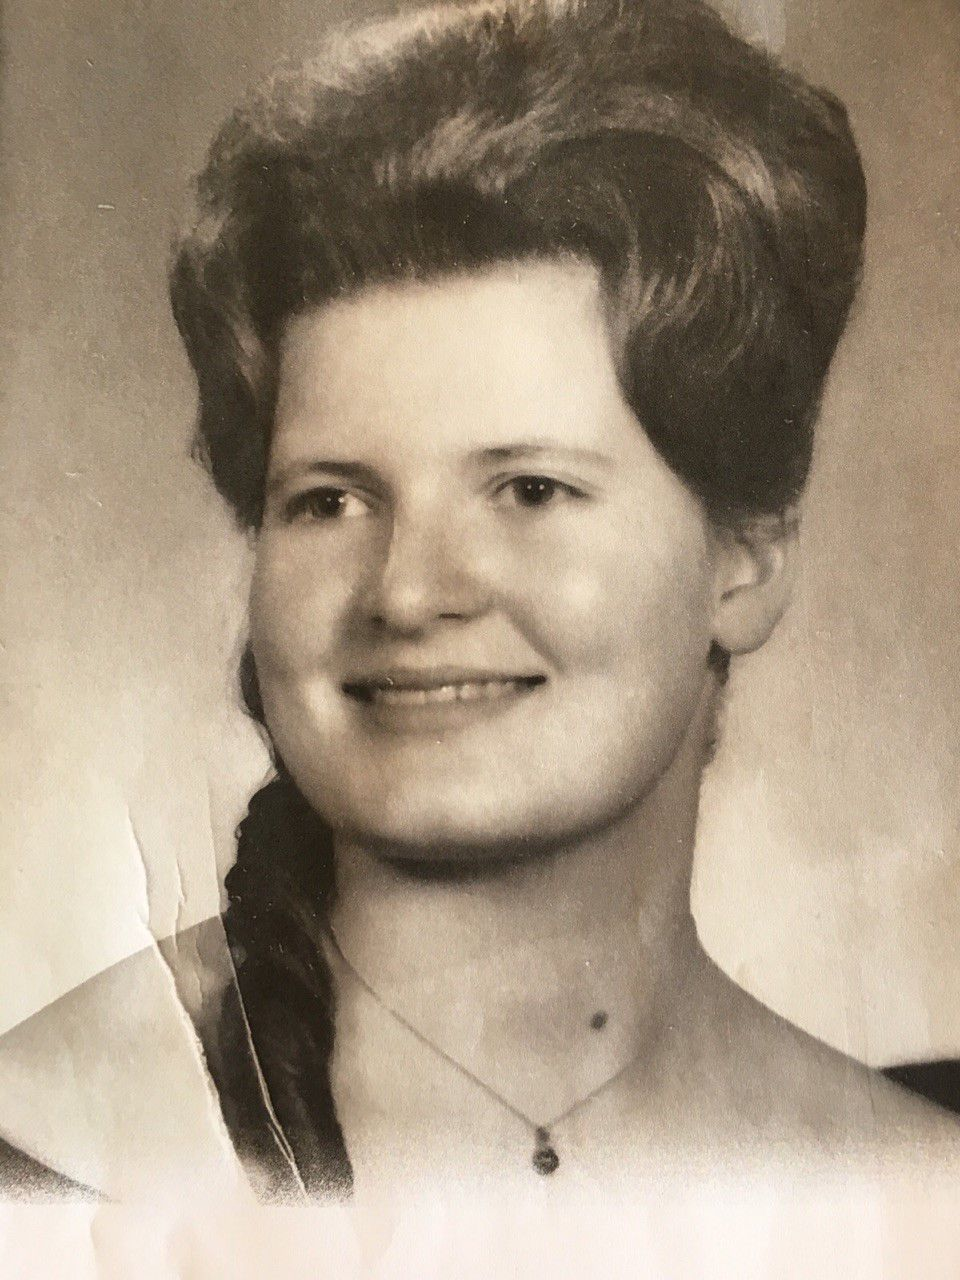 Rosemary Allin Knight